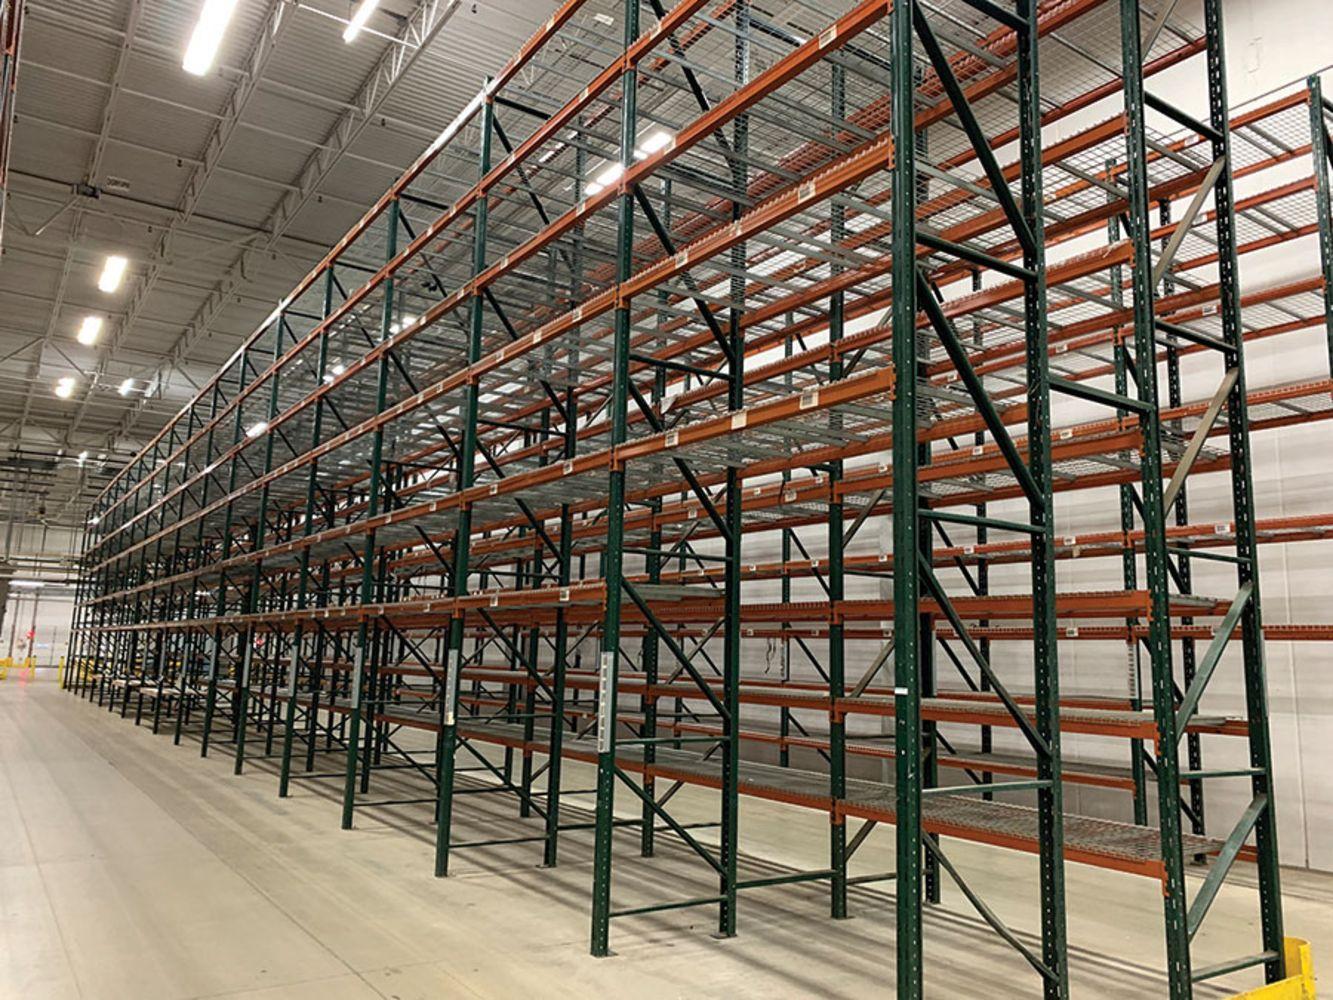 CRAFT SUPPLY DISTRIBUTION CENTER #1 - 400,000 SF Distribution Center - Pallet Racking, Material Handling, Balers & Packaging